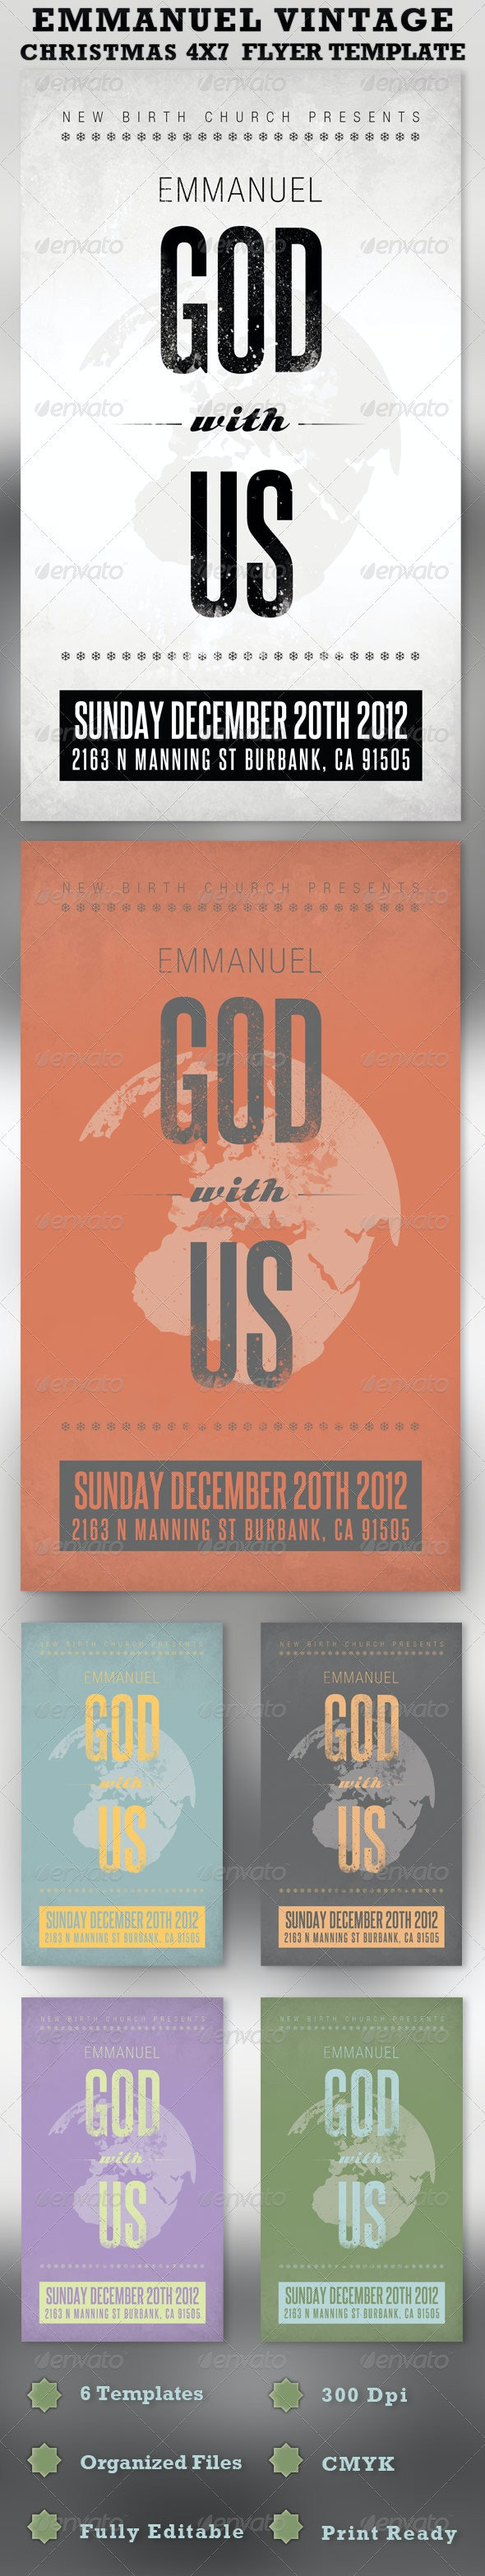 Emmanuel Christmas Church Flyer Template - Church Flyers